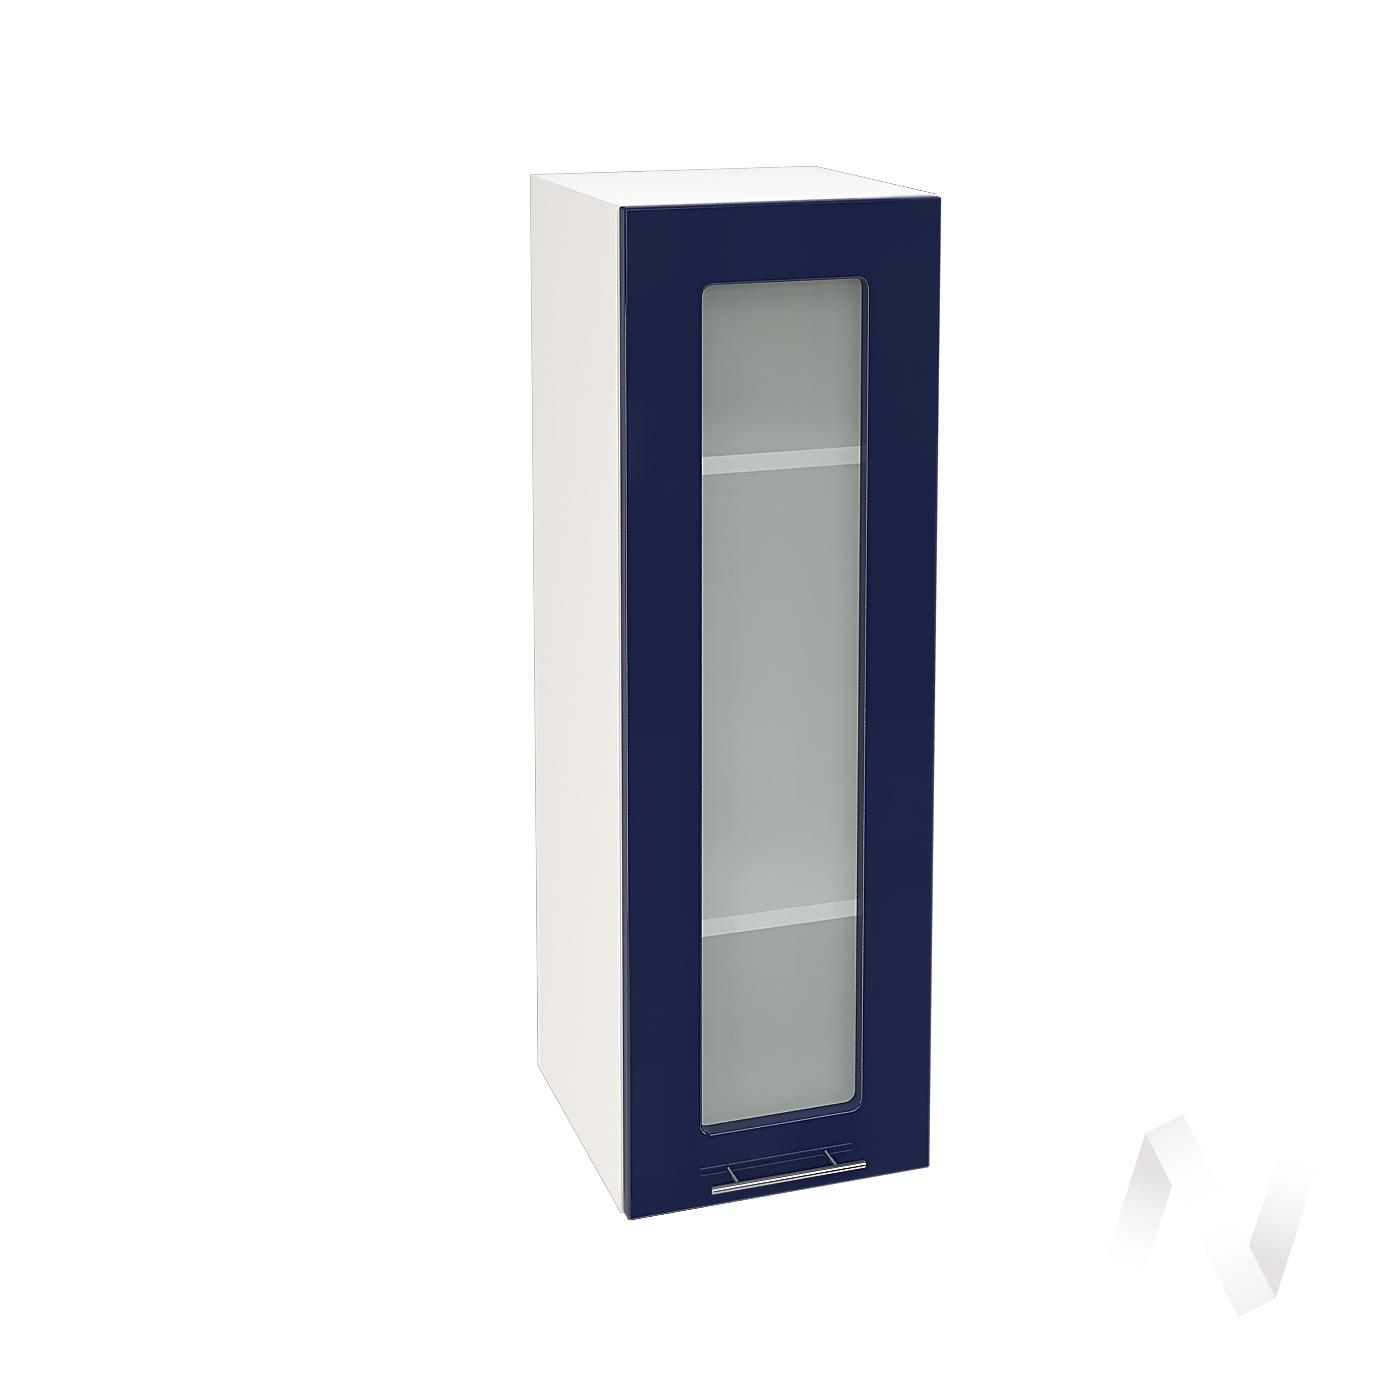 "Кухня ""Валерия-М"": Шкаф верхний со стеклом 309, ШВС 309 (Синий глянец/корпус белый)"